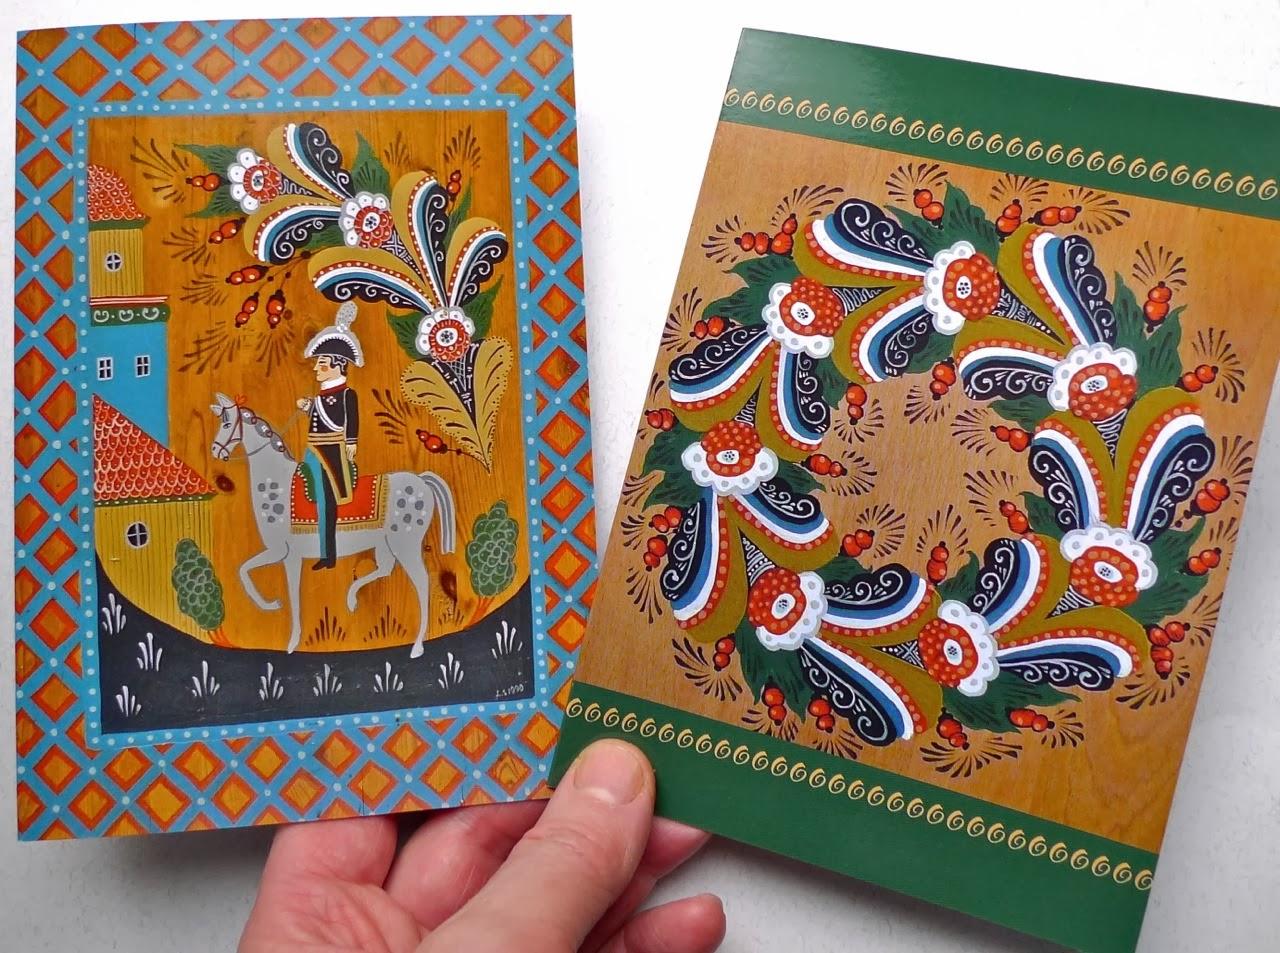 VIKTOR DONOVAN: TIME FOR CHRISTMAS CARDS